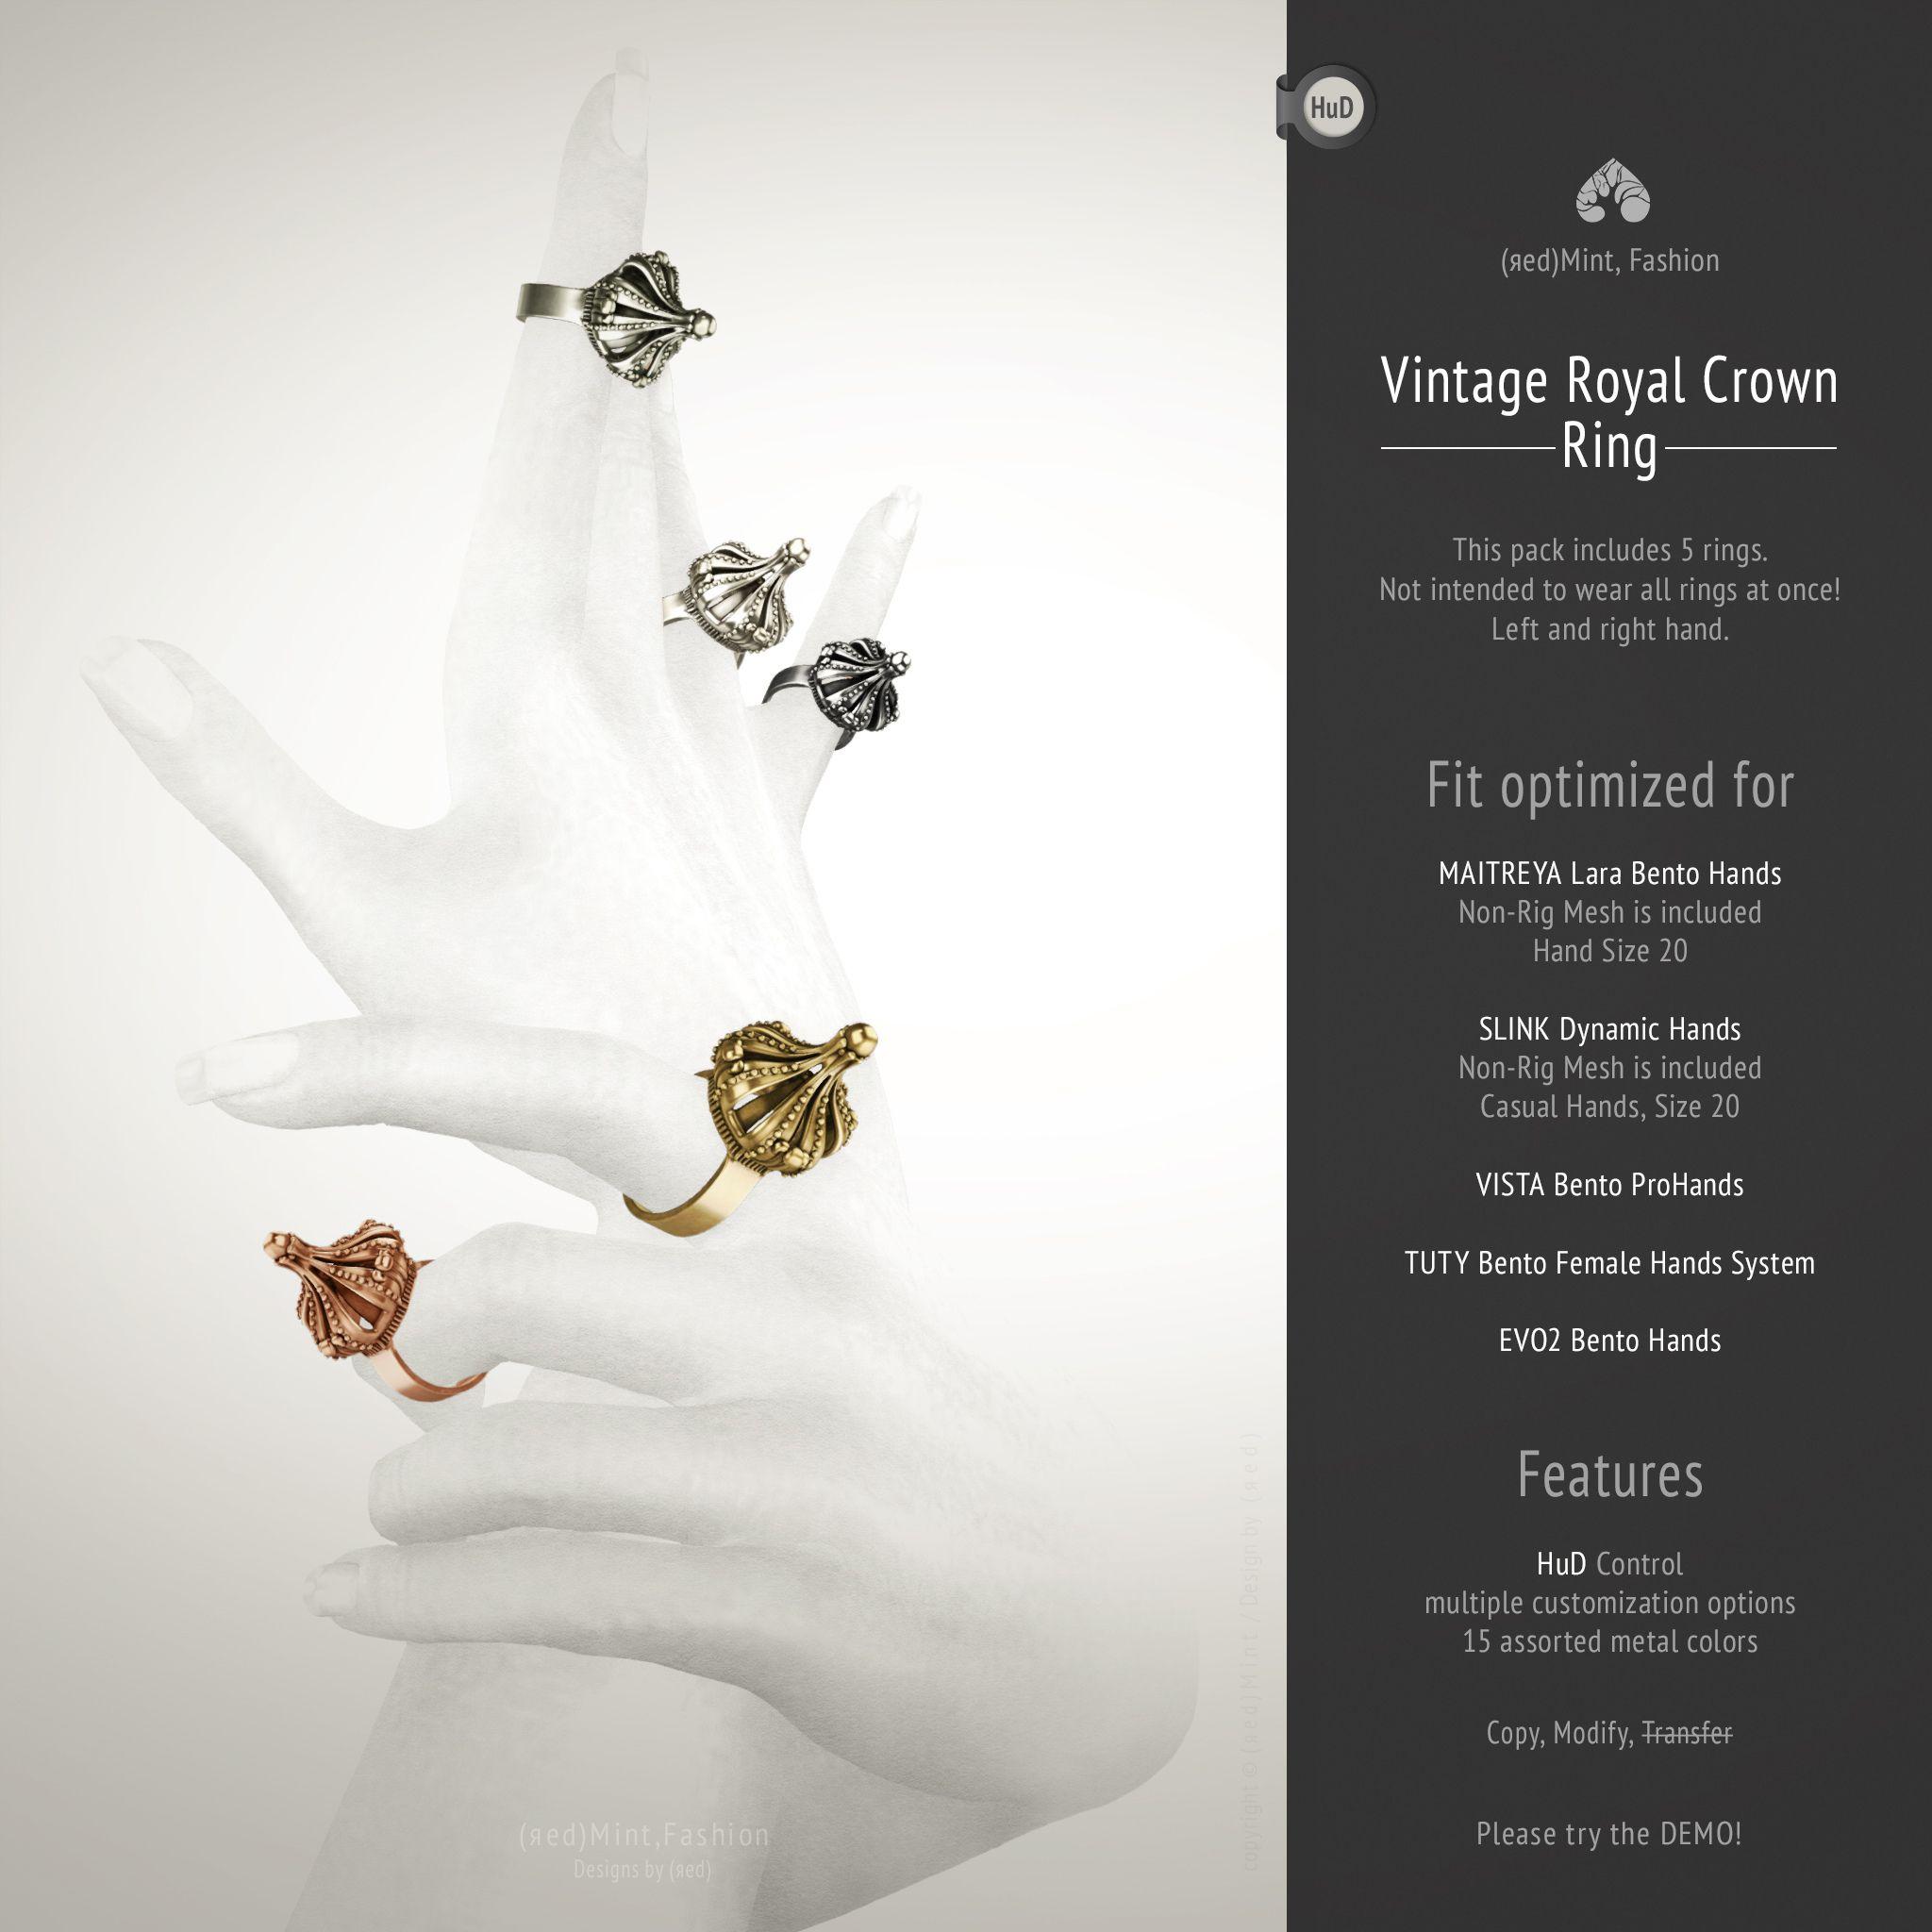 https://flic.kr/p/Wt1kxV | (r)M, Vintage Royal Crown Ring | > more info